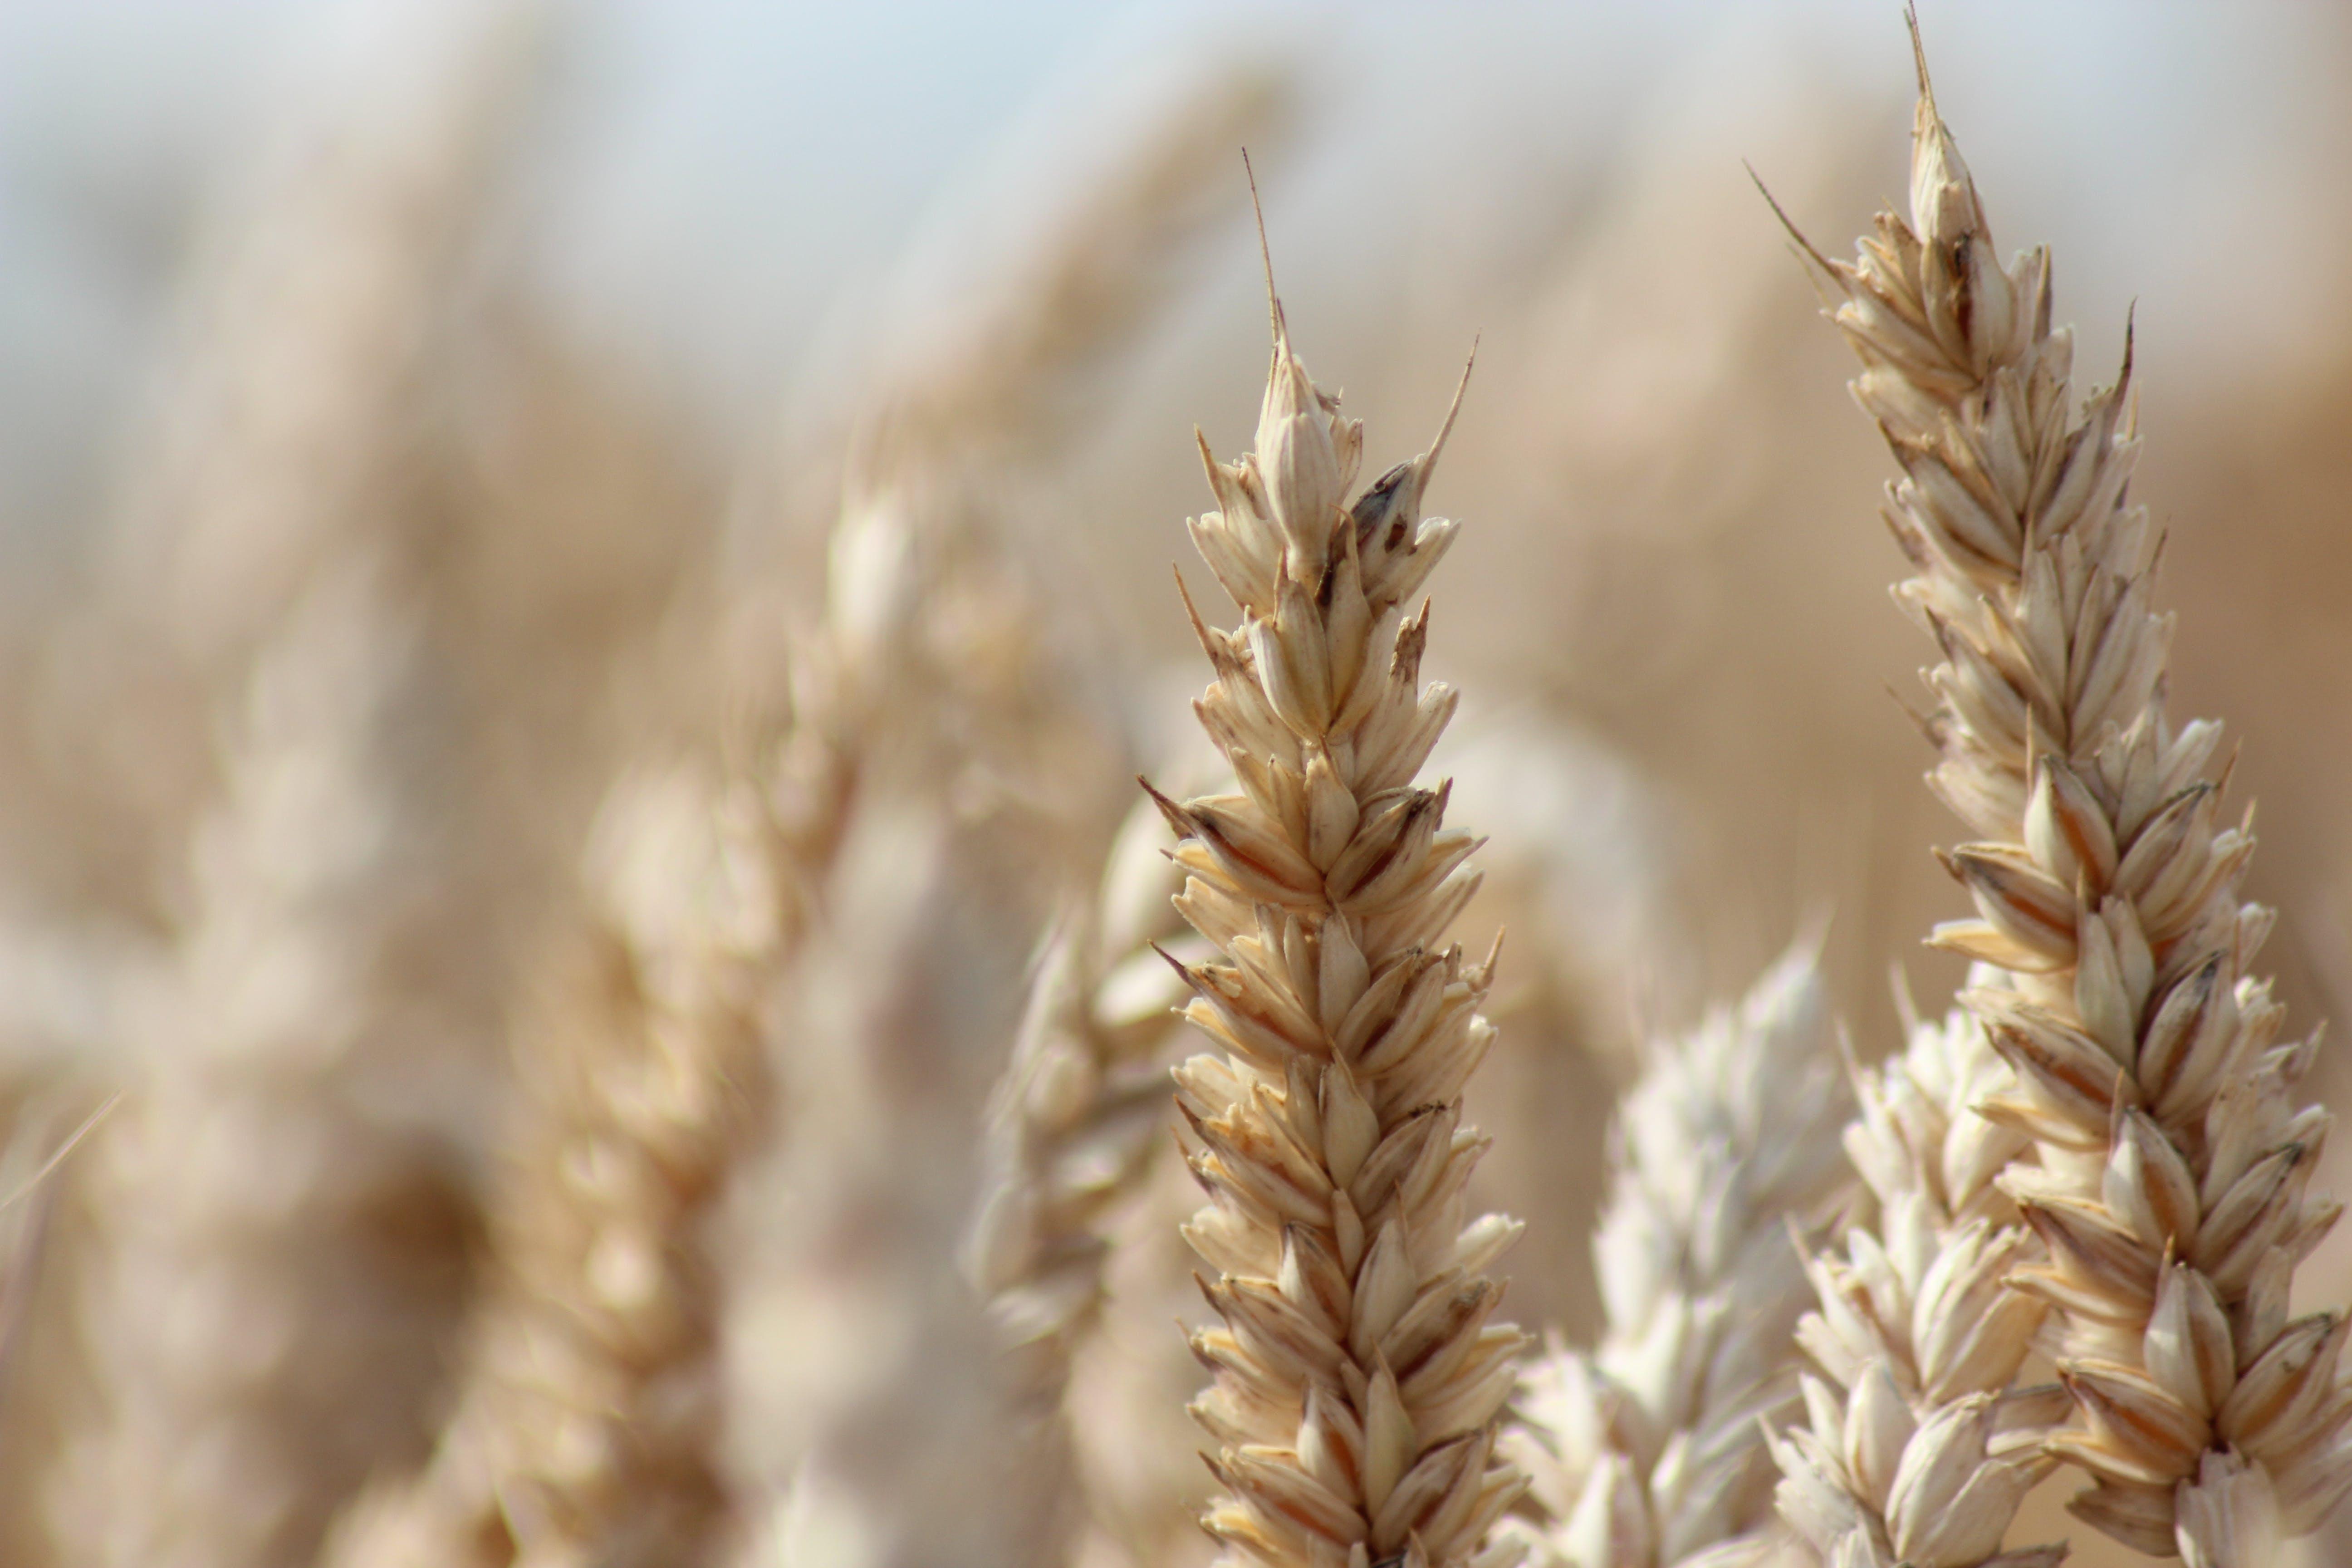 Free stock photo of nature, wheat